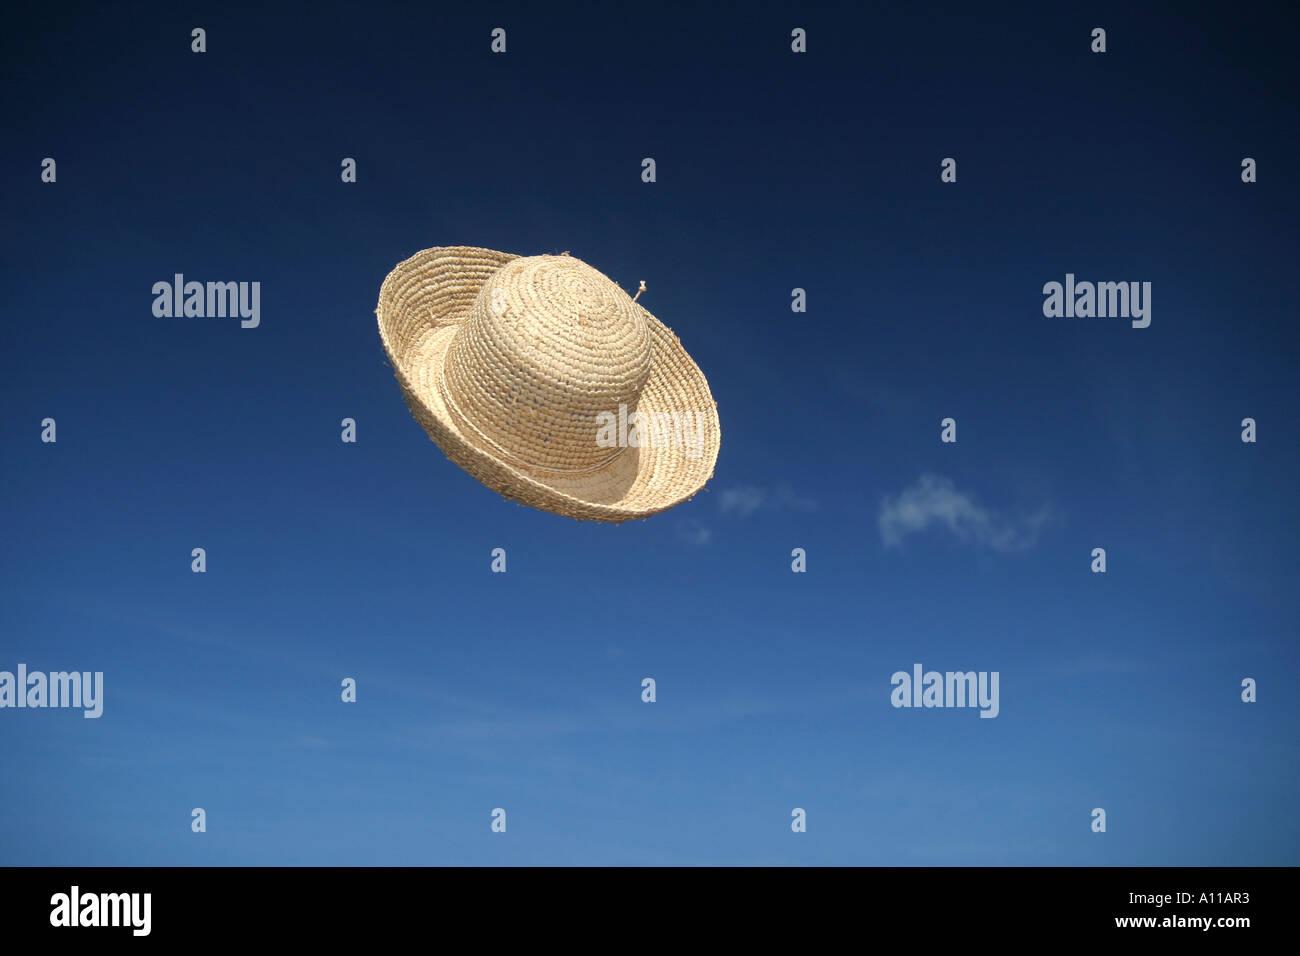 hat 2 - Stock Image